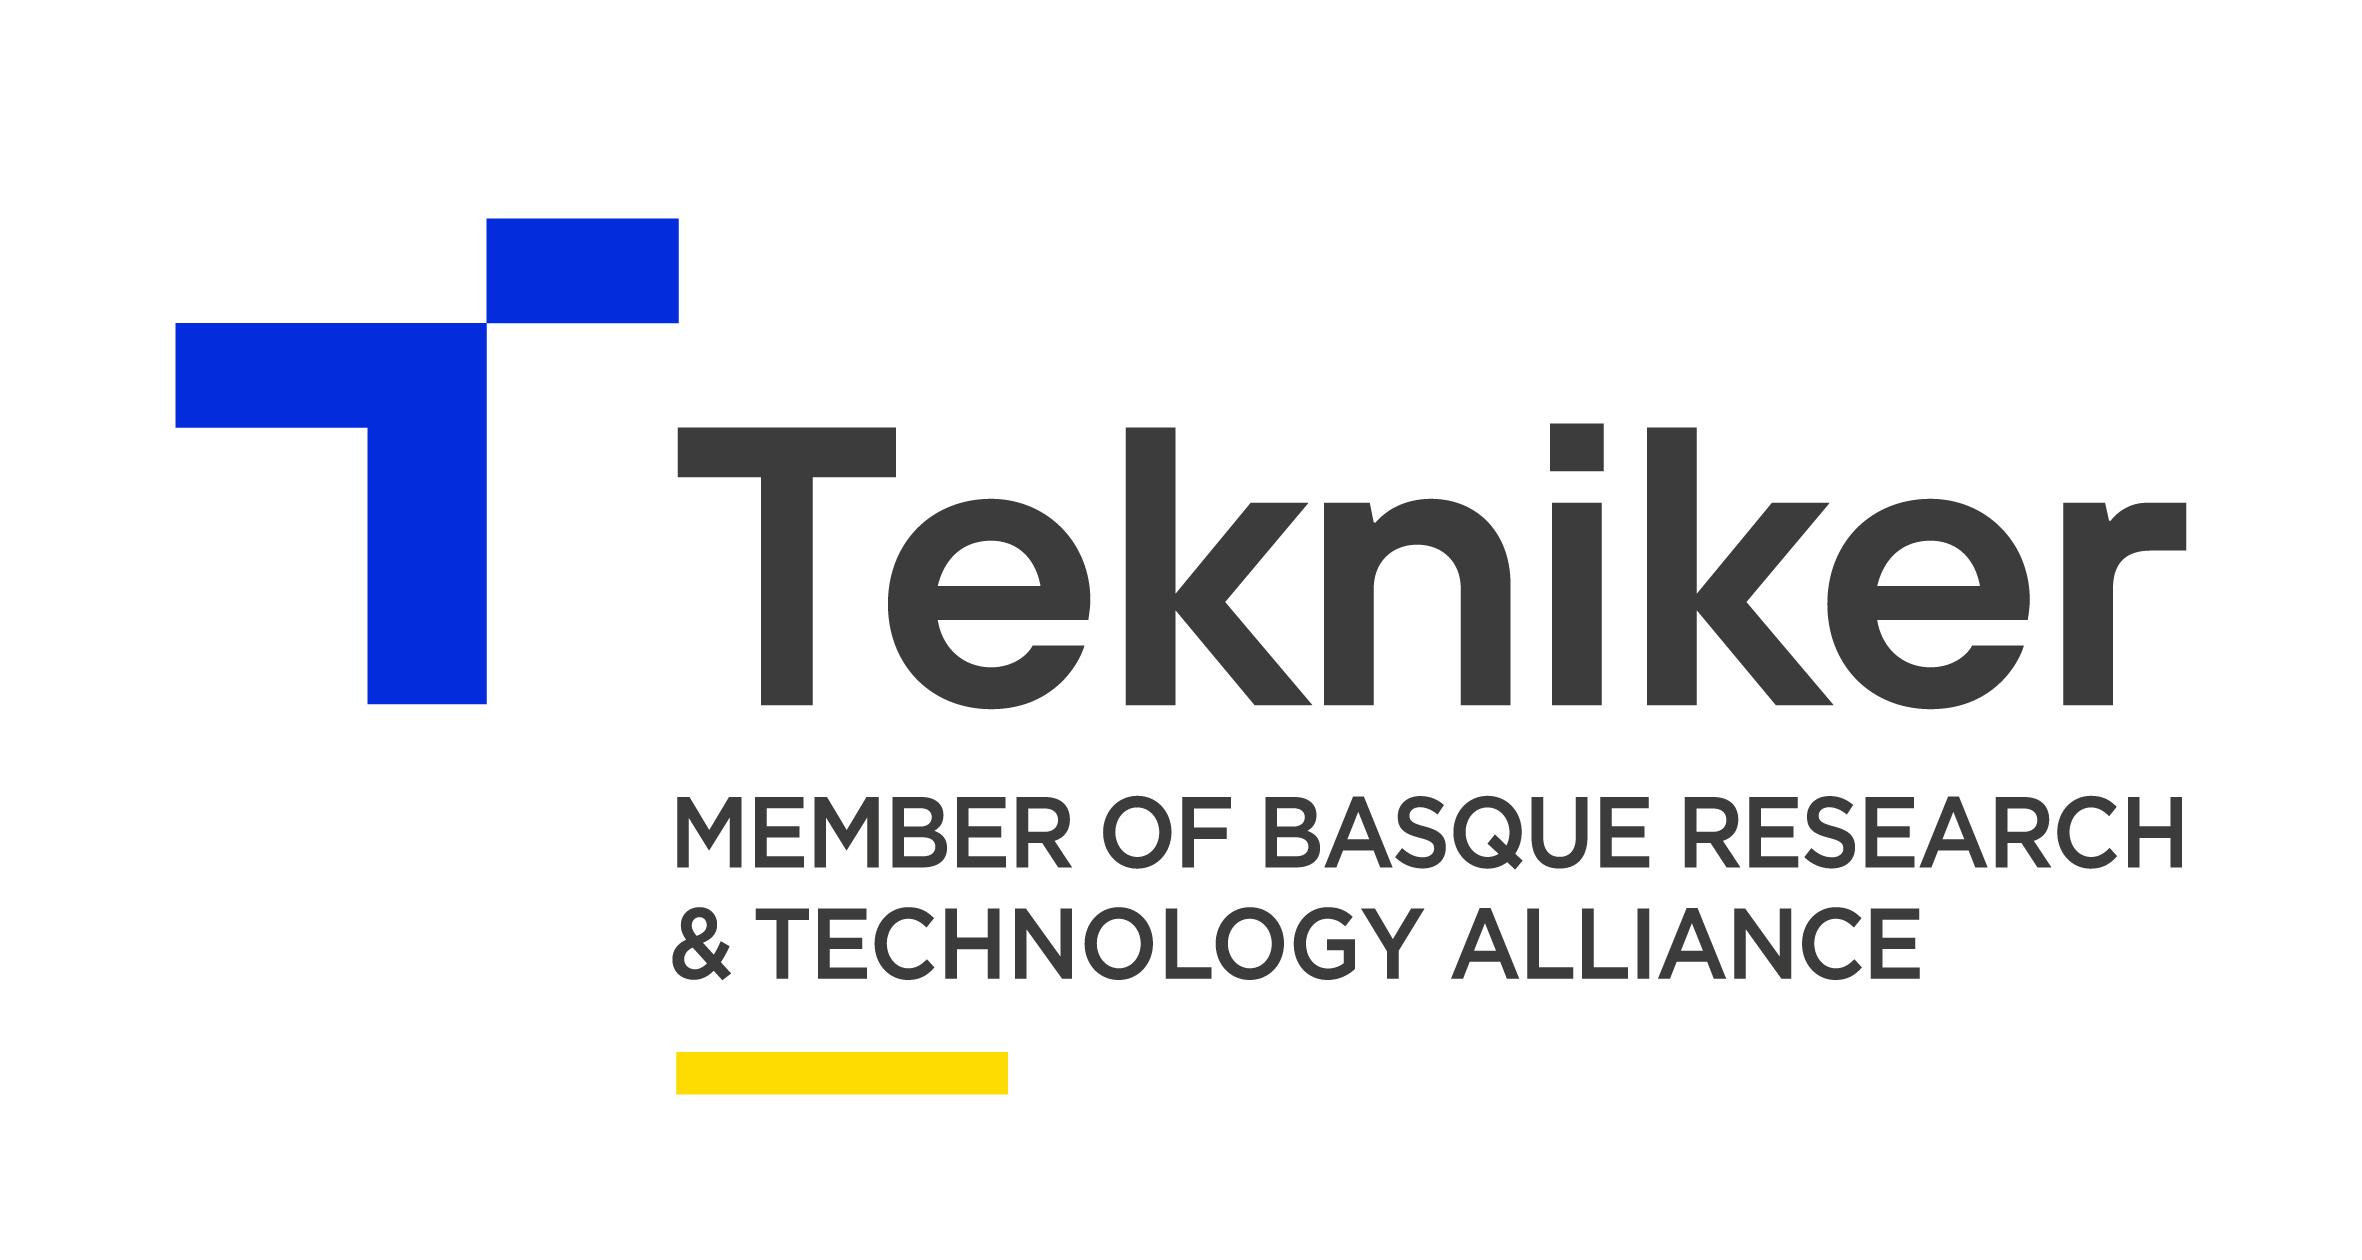 Logotipo Tekniker Oficial